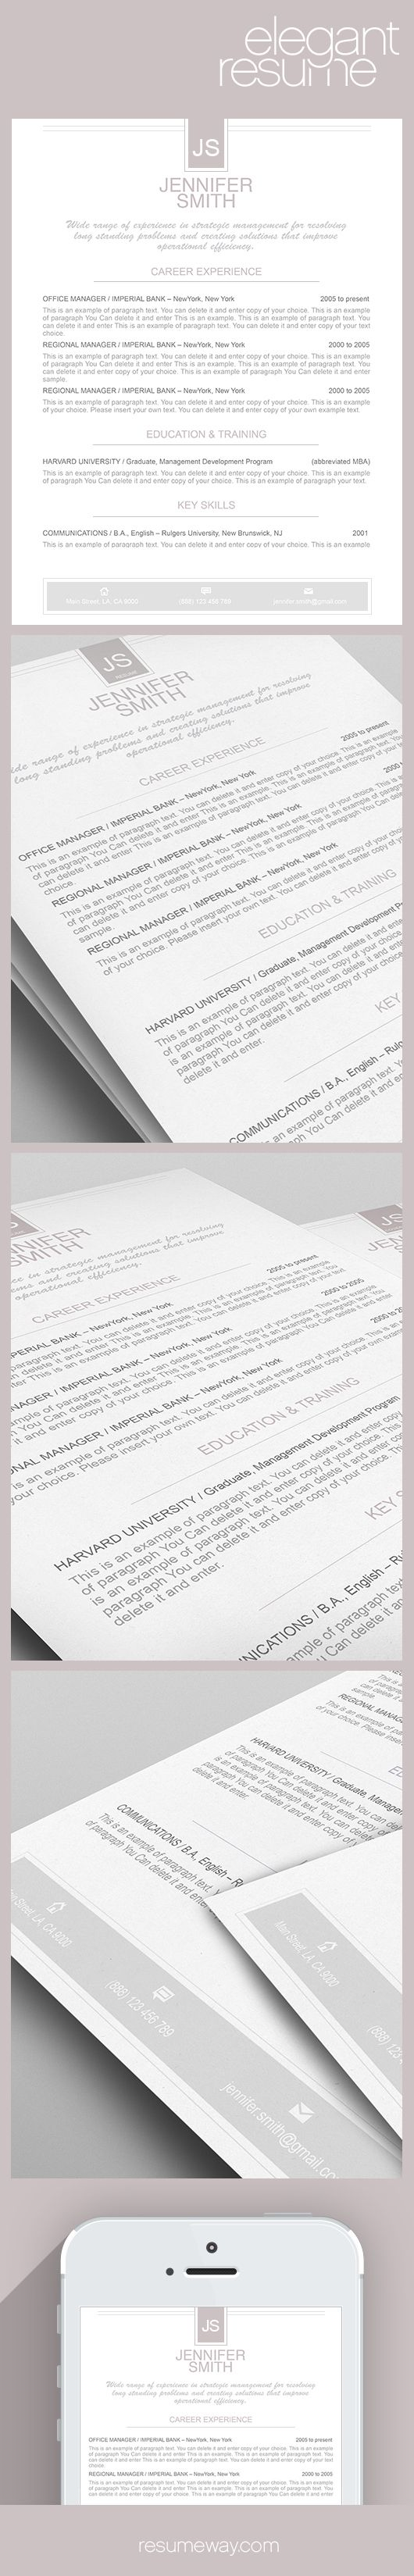 Submit resume online